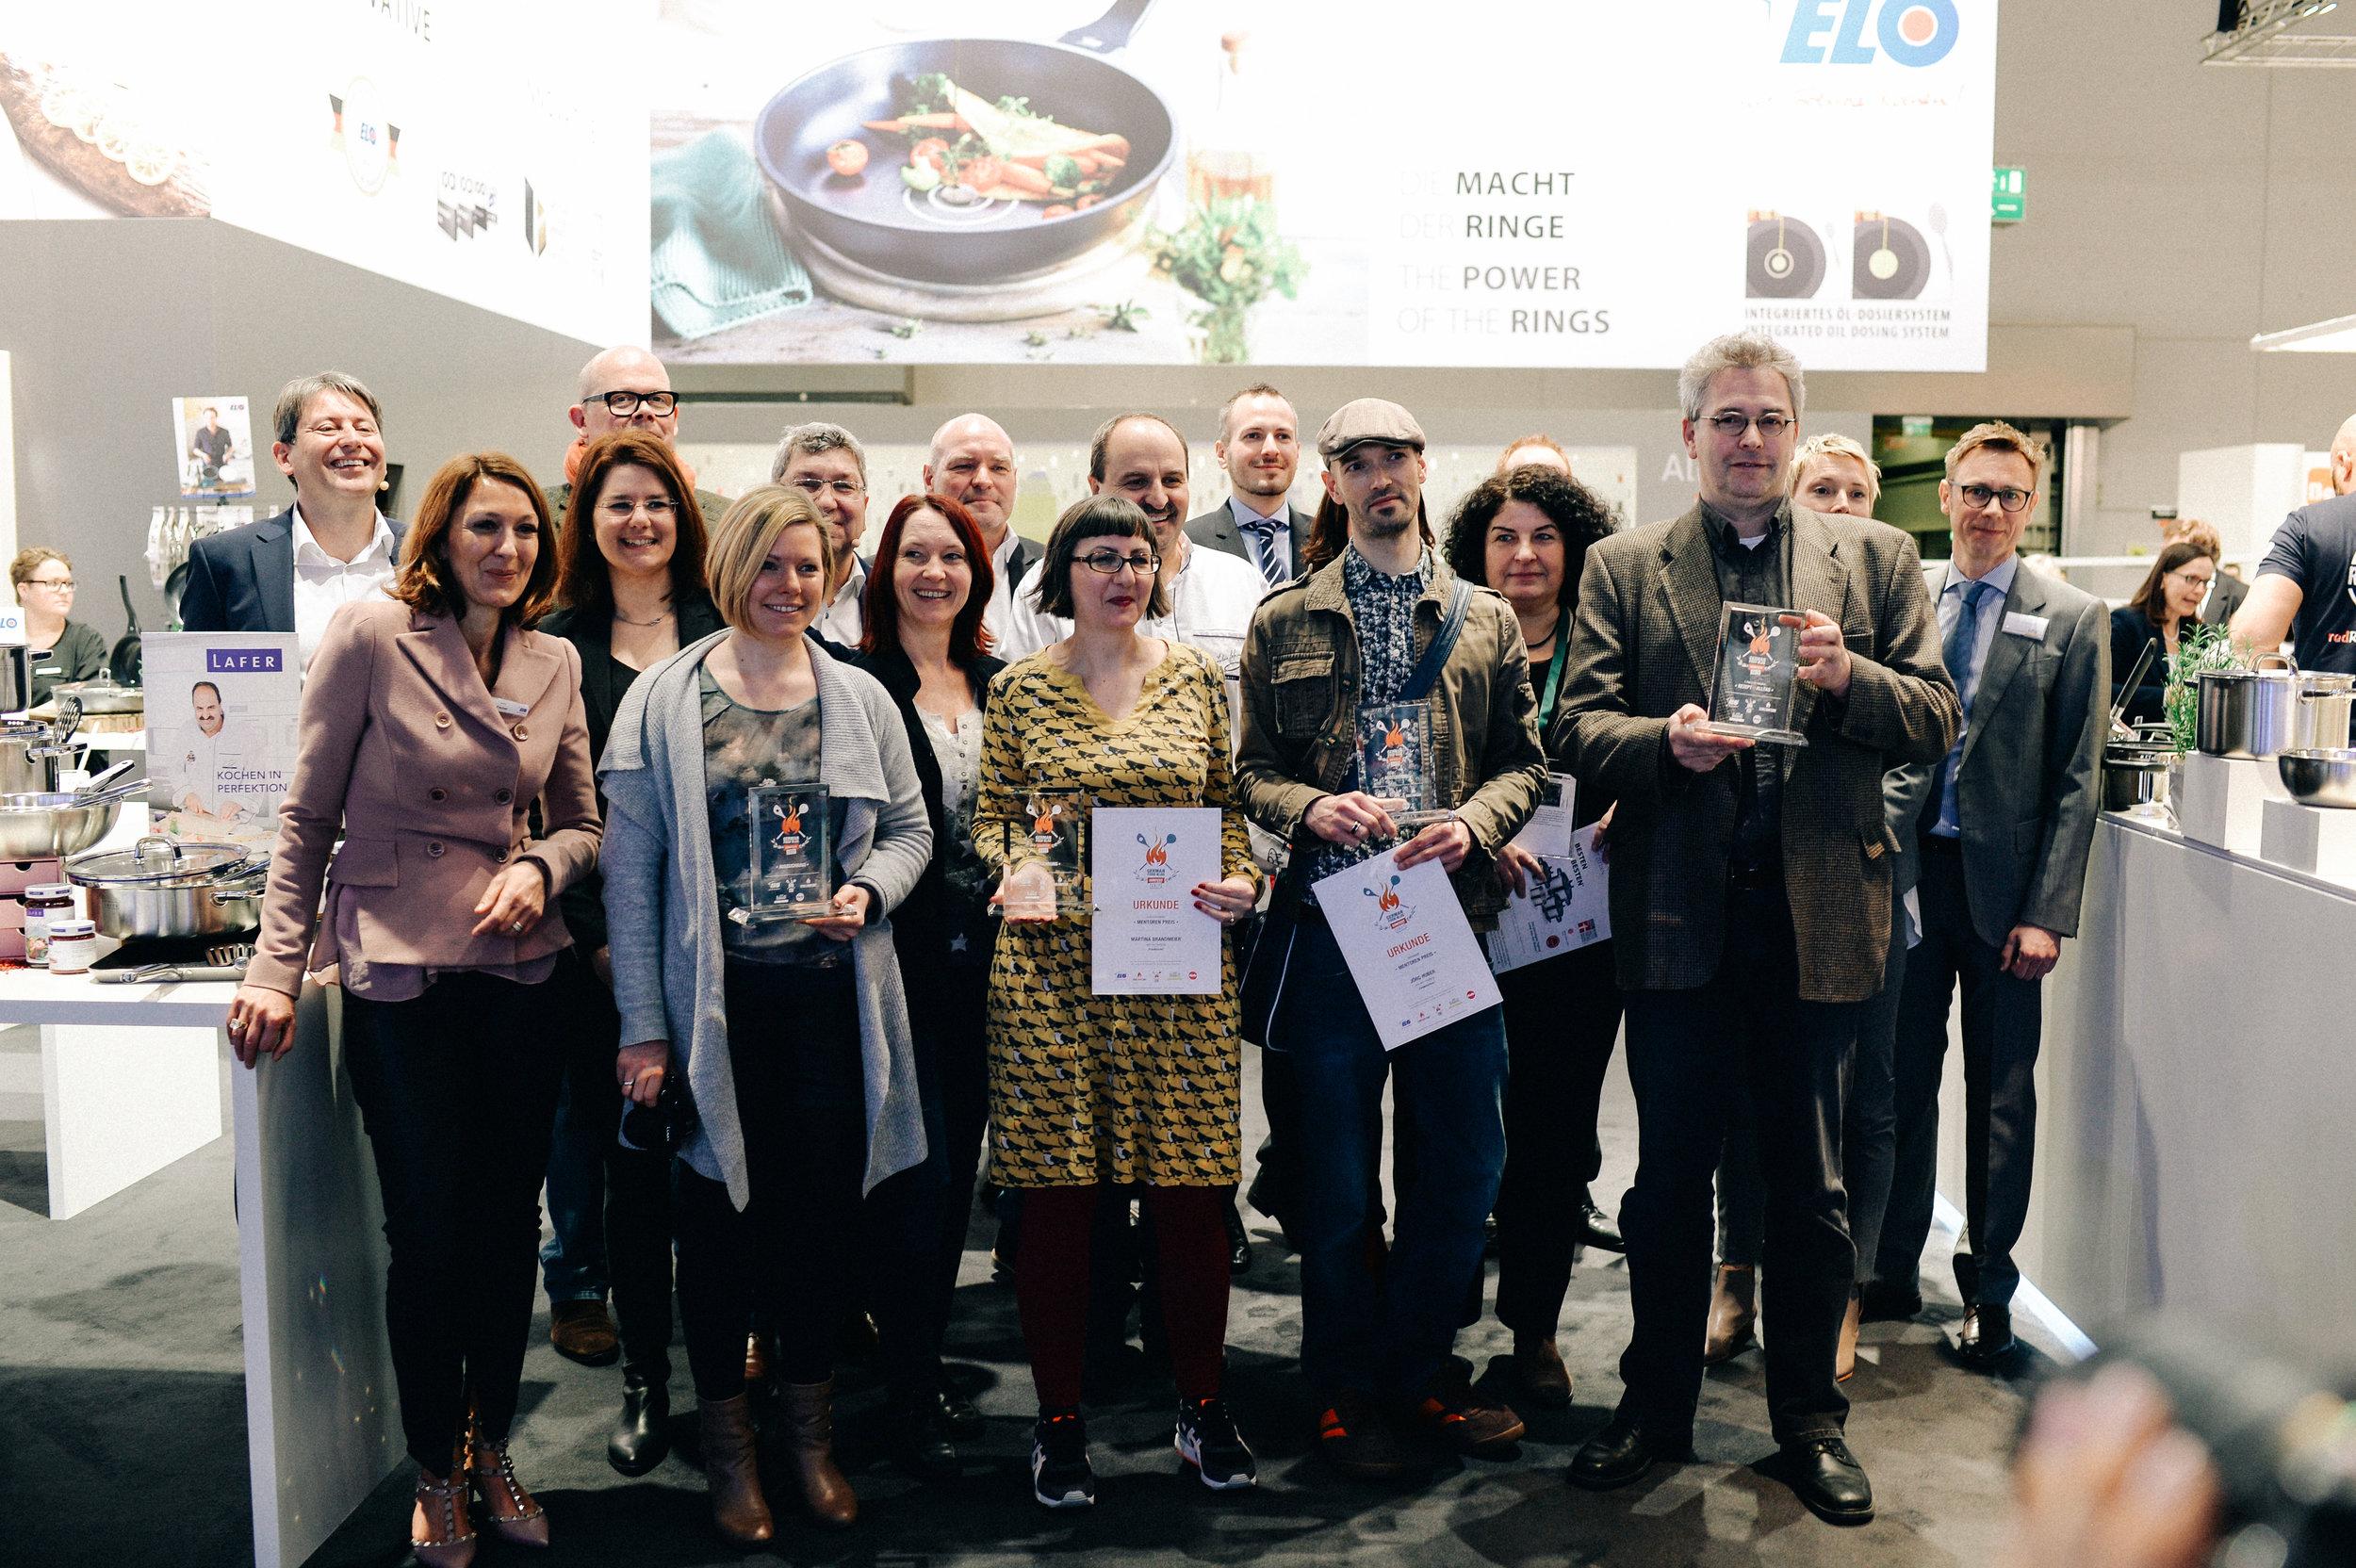 german_food_blog_contest-33.jpg